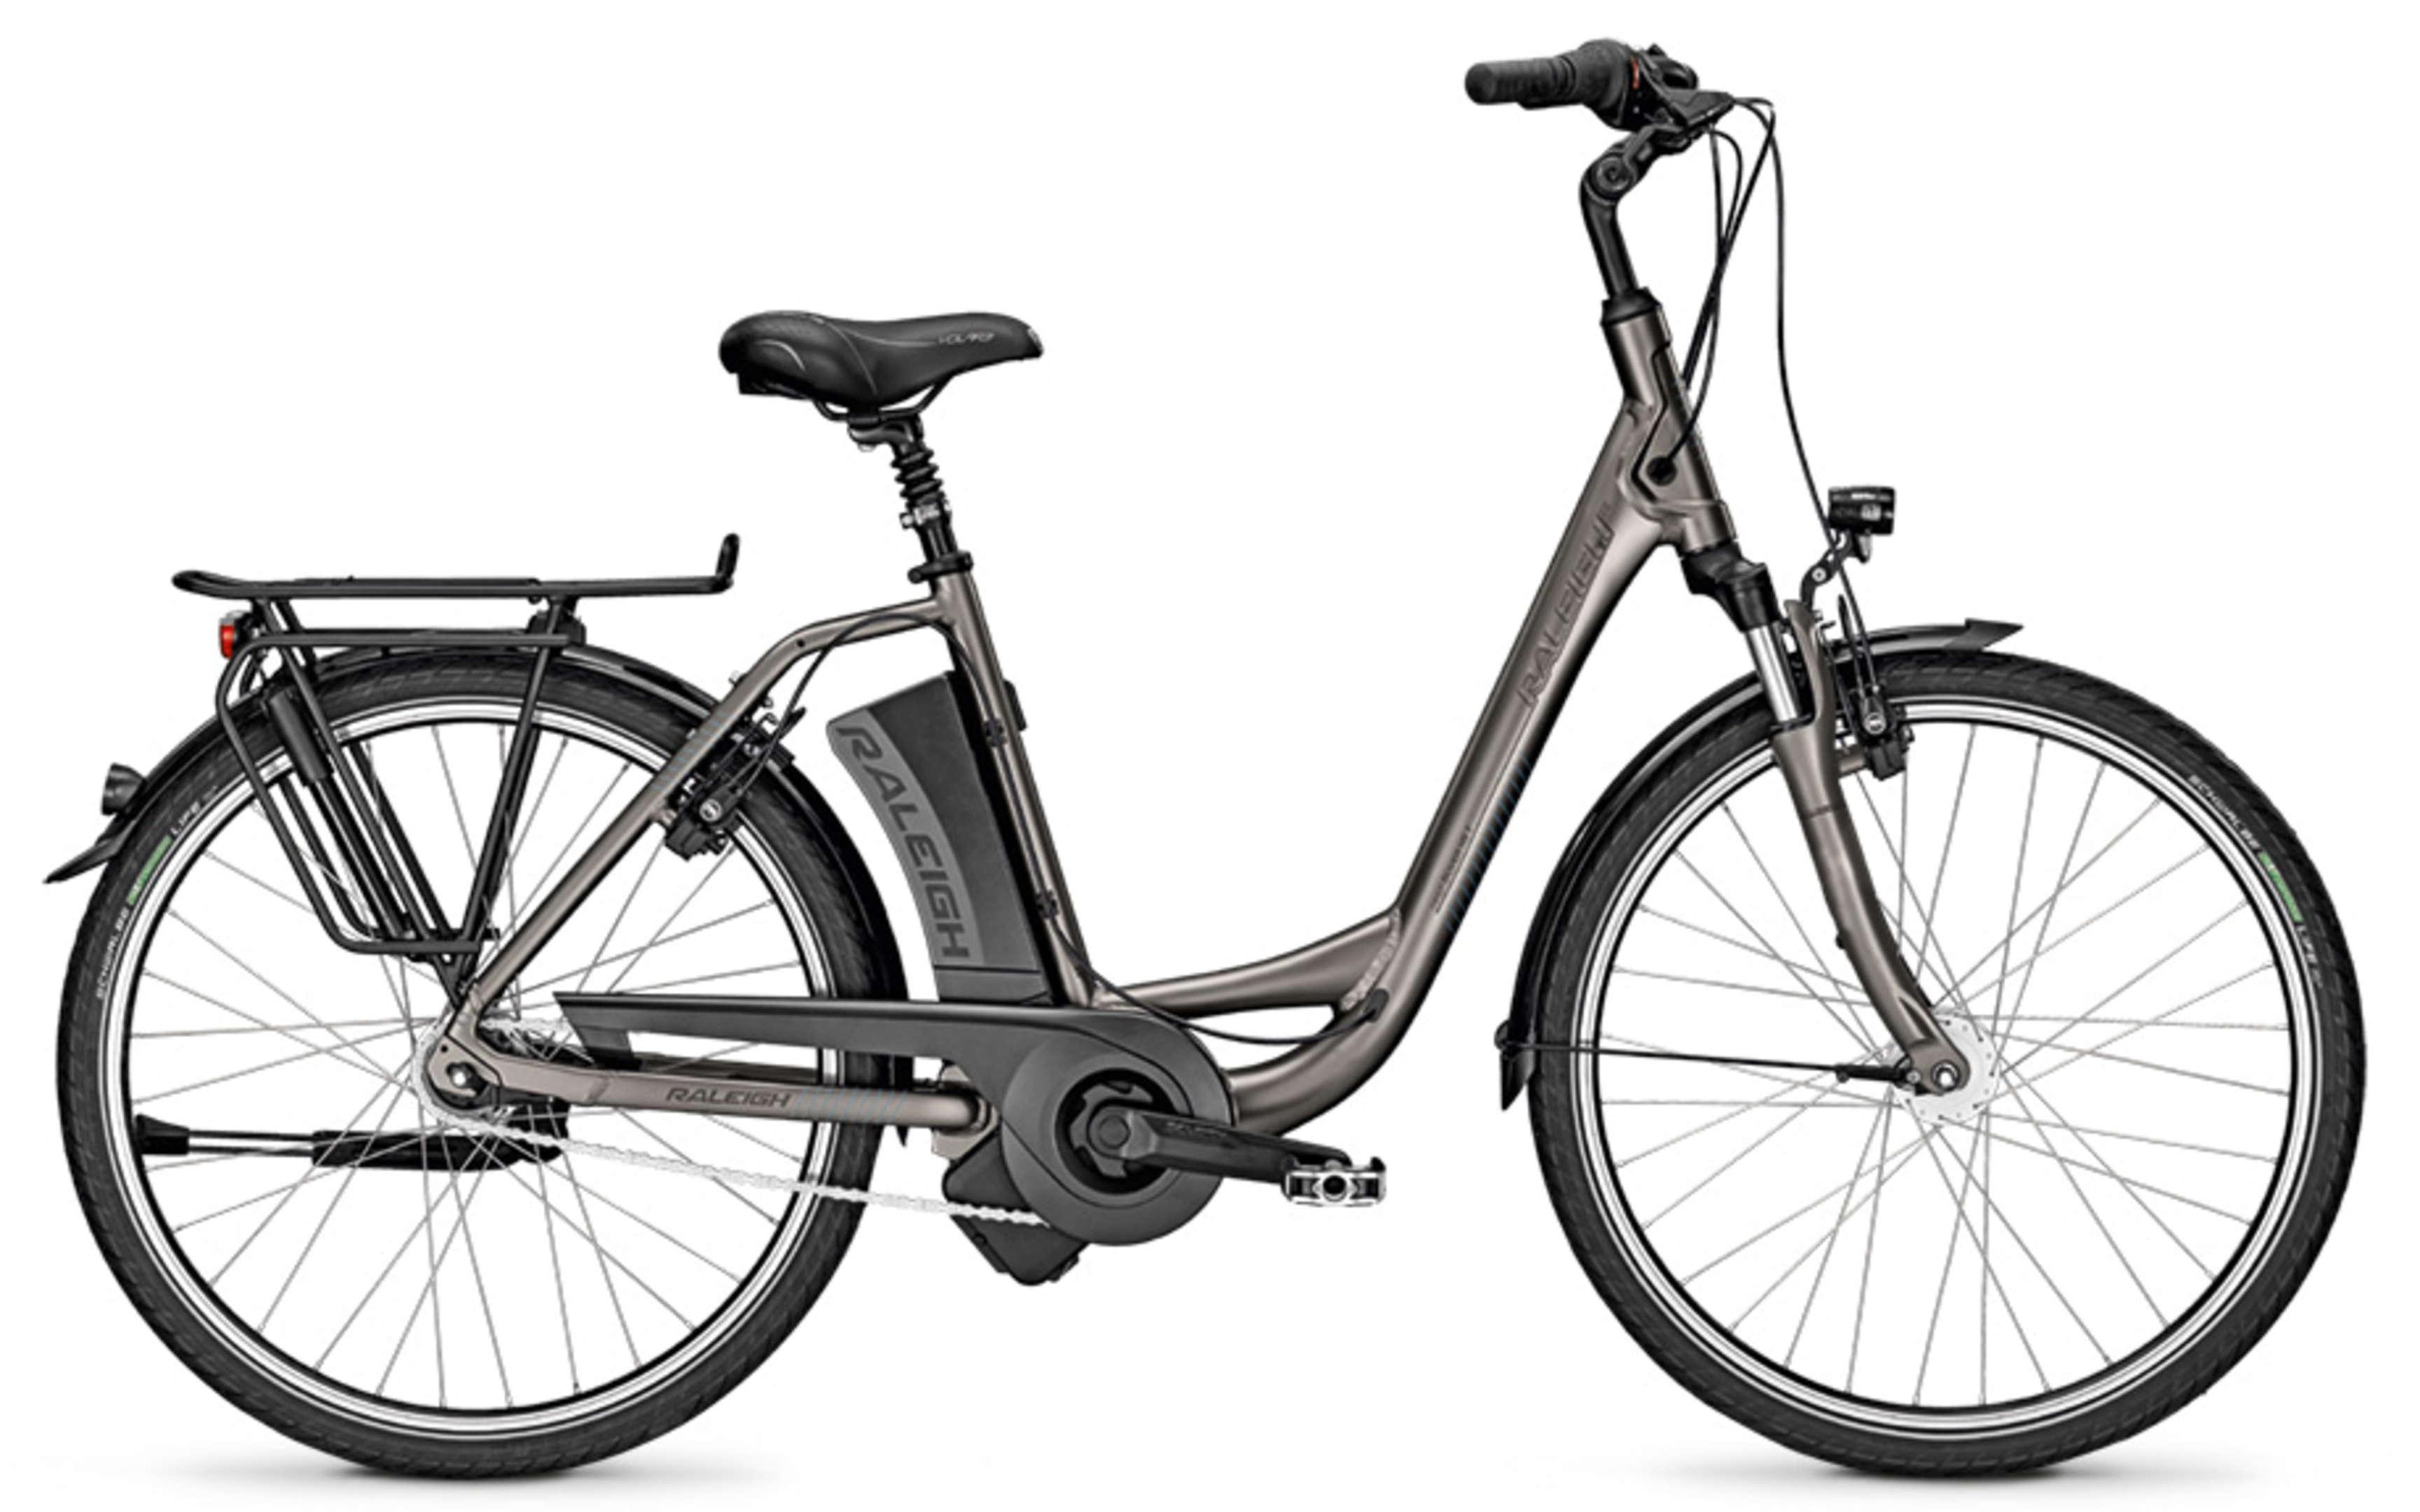 raleigh e bike dover impulse 7 hs 7g 11ah 36v eurorad. Black Bedroom Furniture Sets. Home Design Ideas